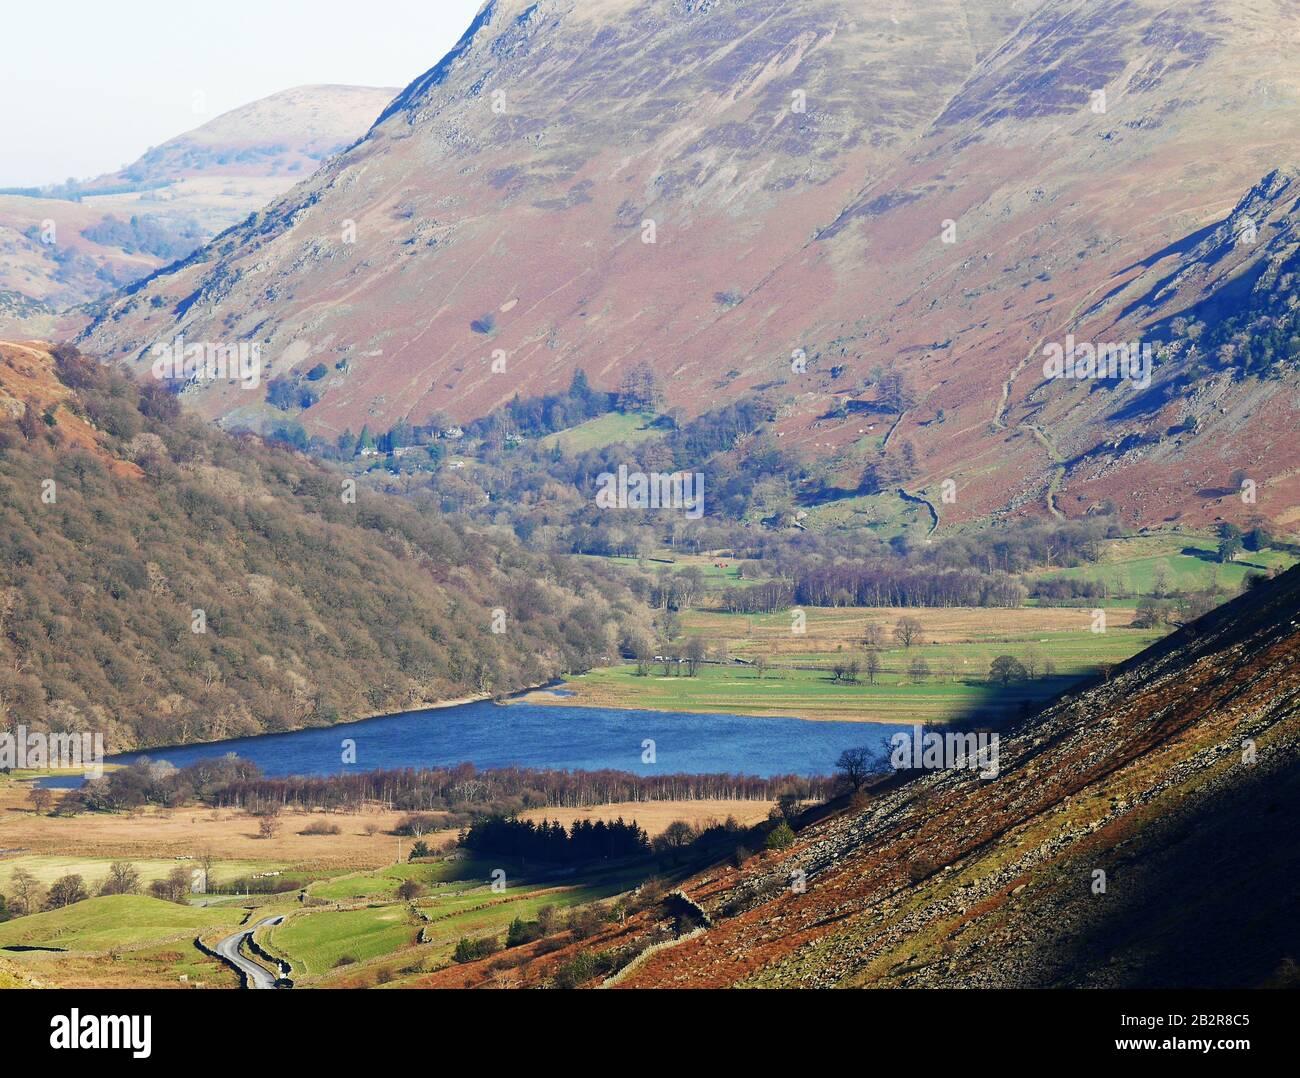 El Paso Kirkstone, Mirando Hacia Brotherswater, Lake District National Park, Cumbria, Inglaterra, Reino Unido Foto de stock